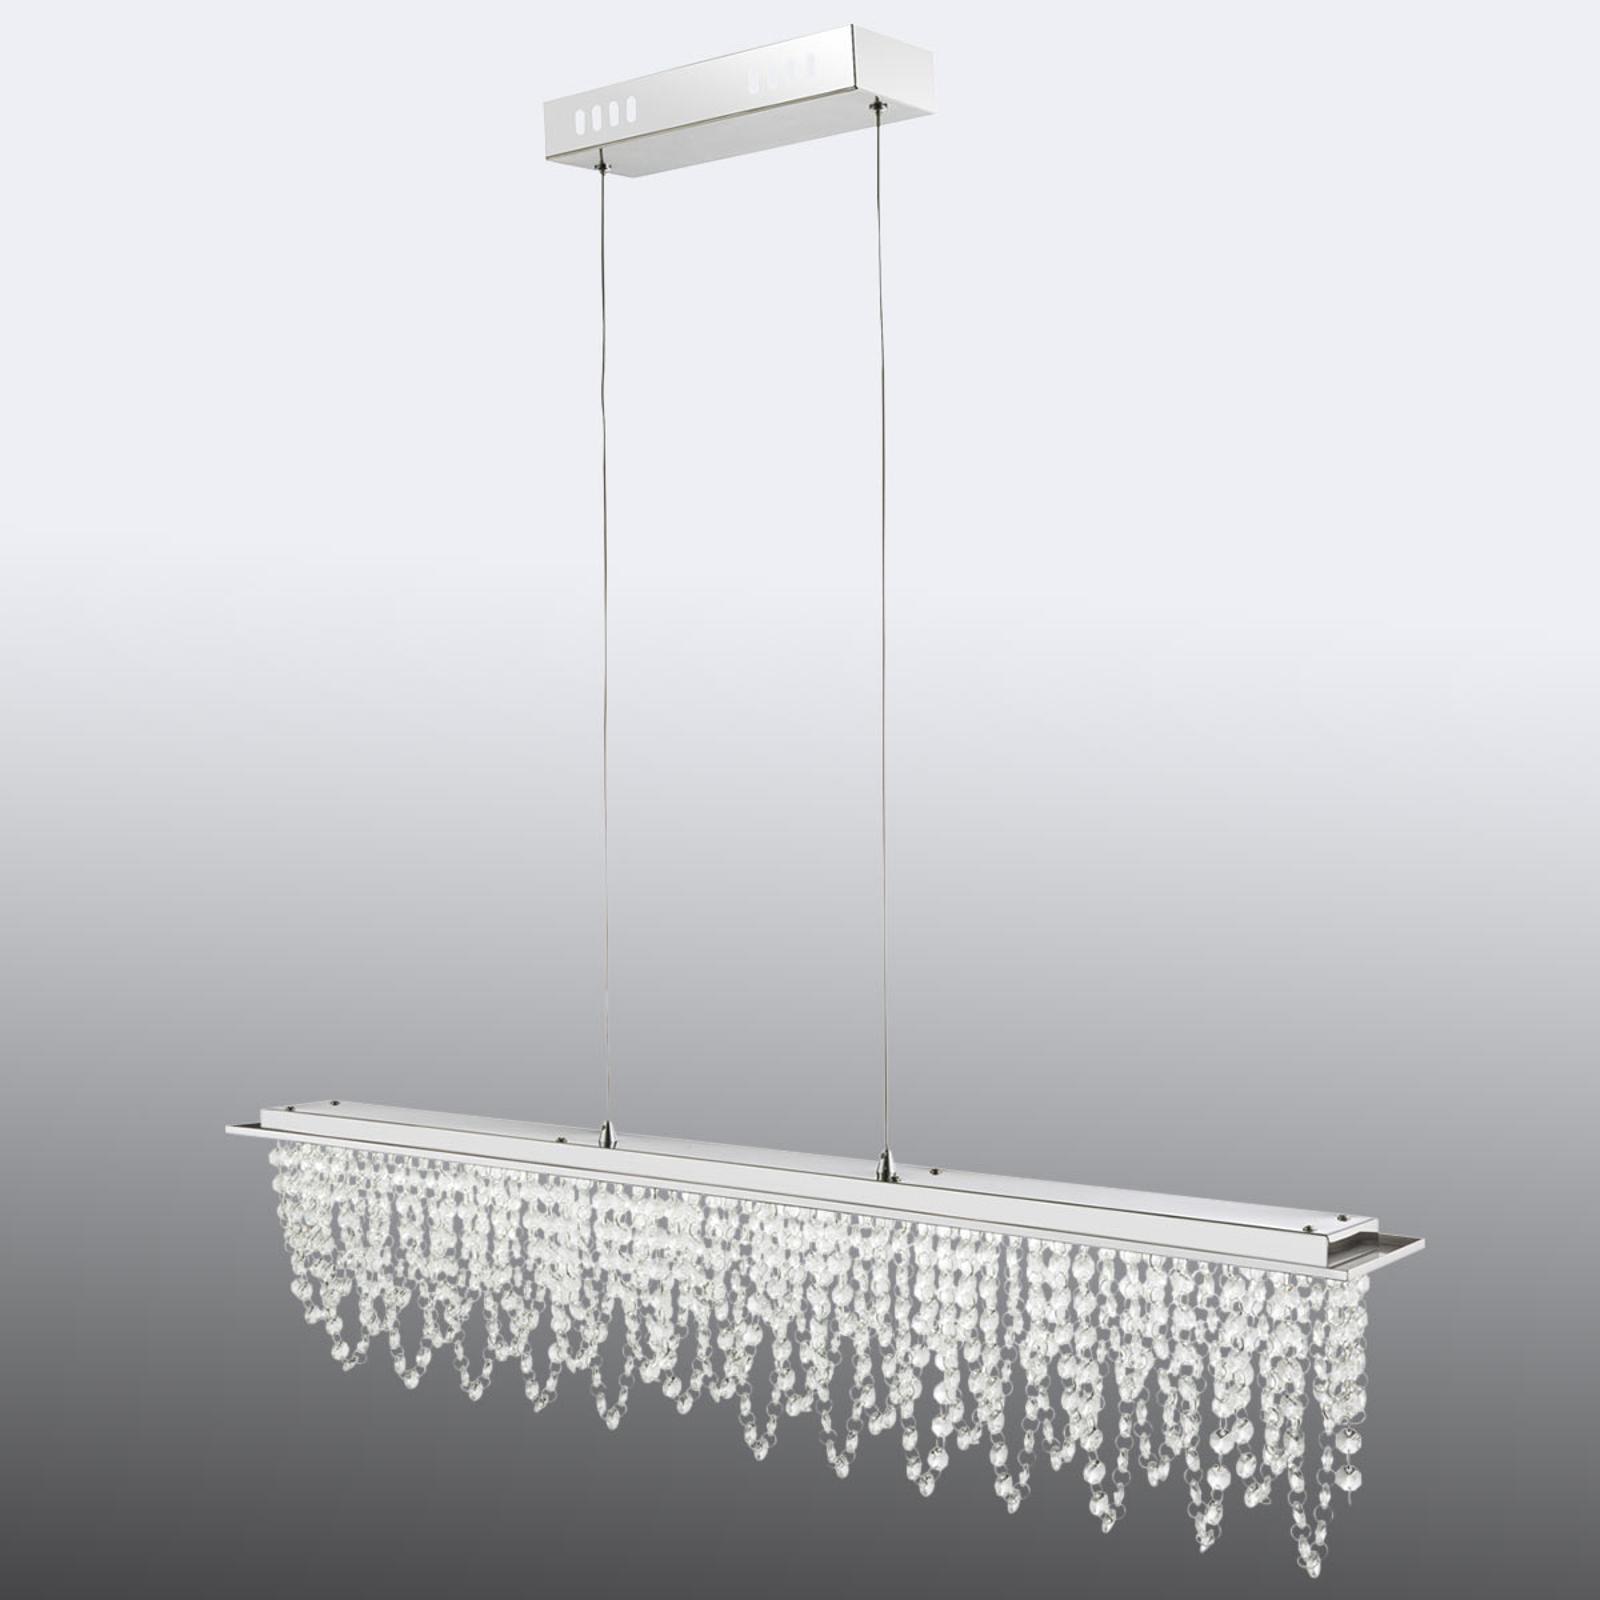 LED-pendellampe Scala, bryter, fjernkontroll